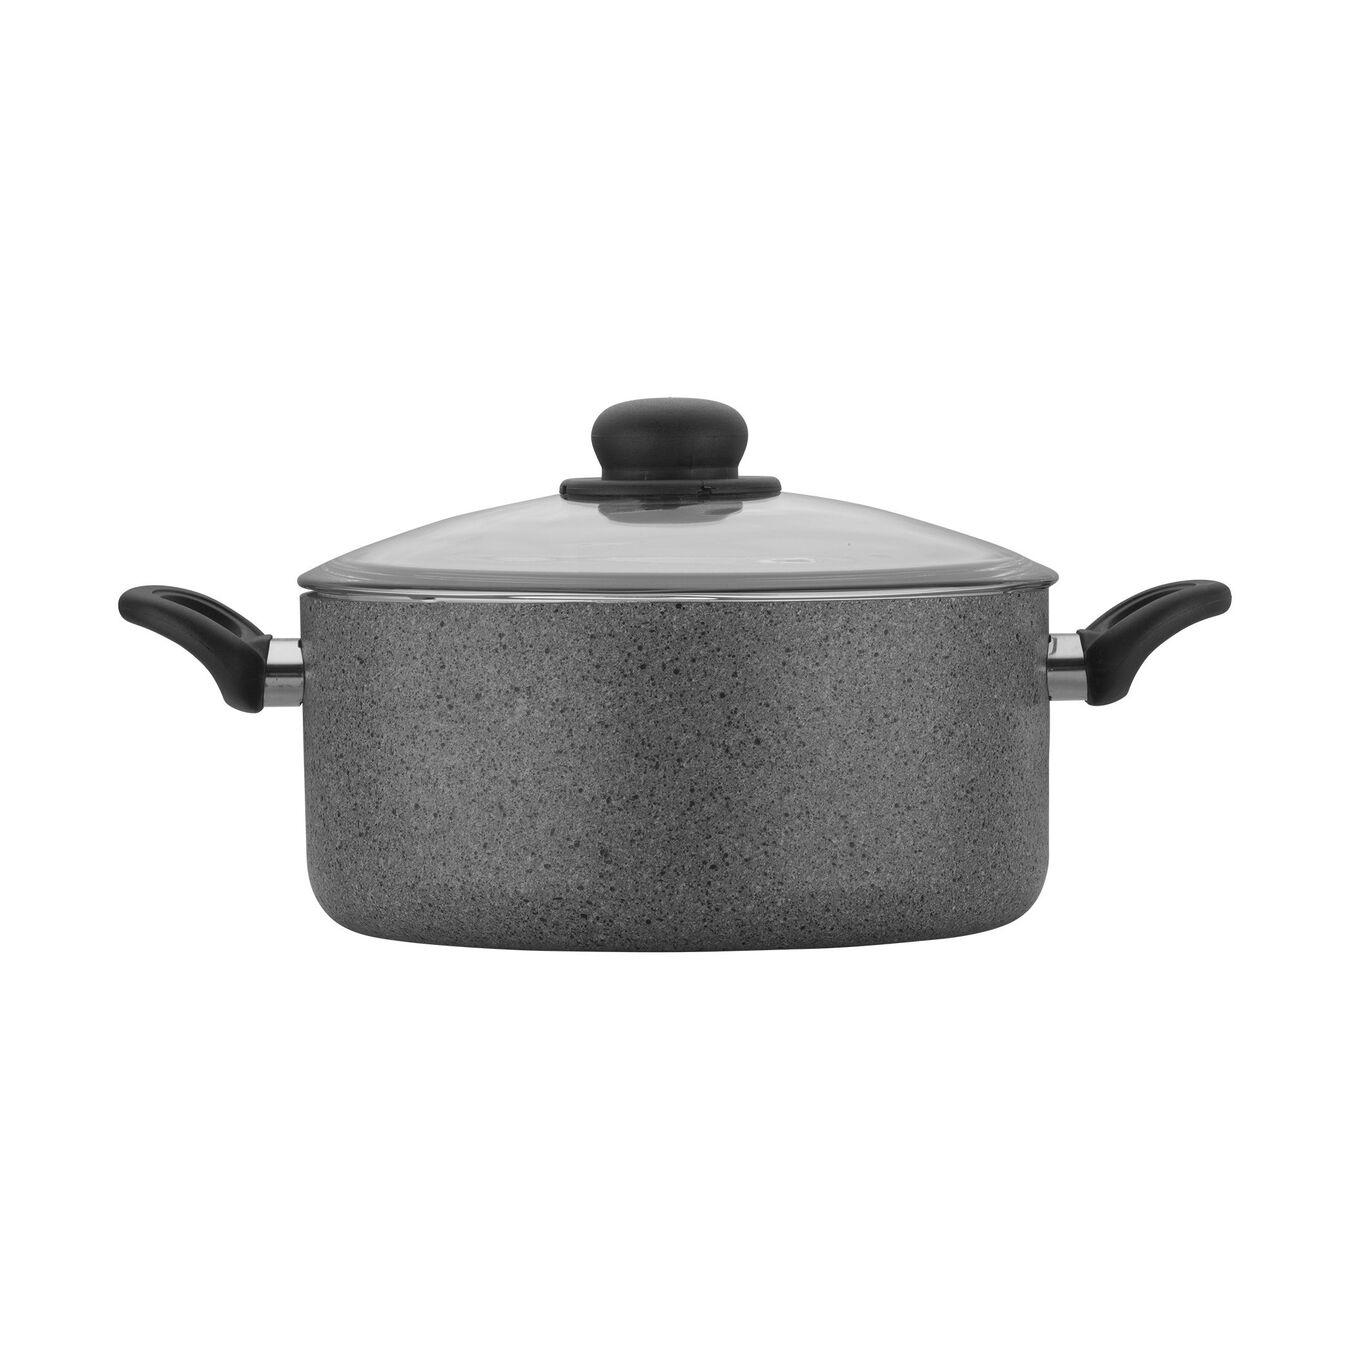 10 Piece Aluminum Cookware set,,large 4